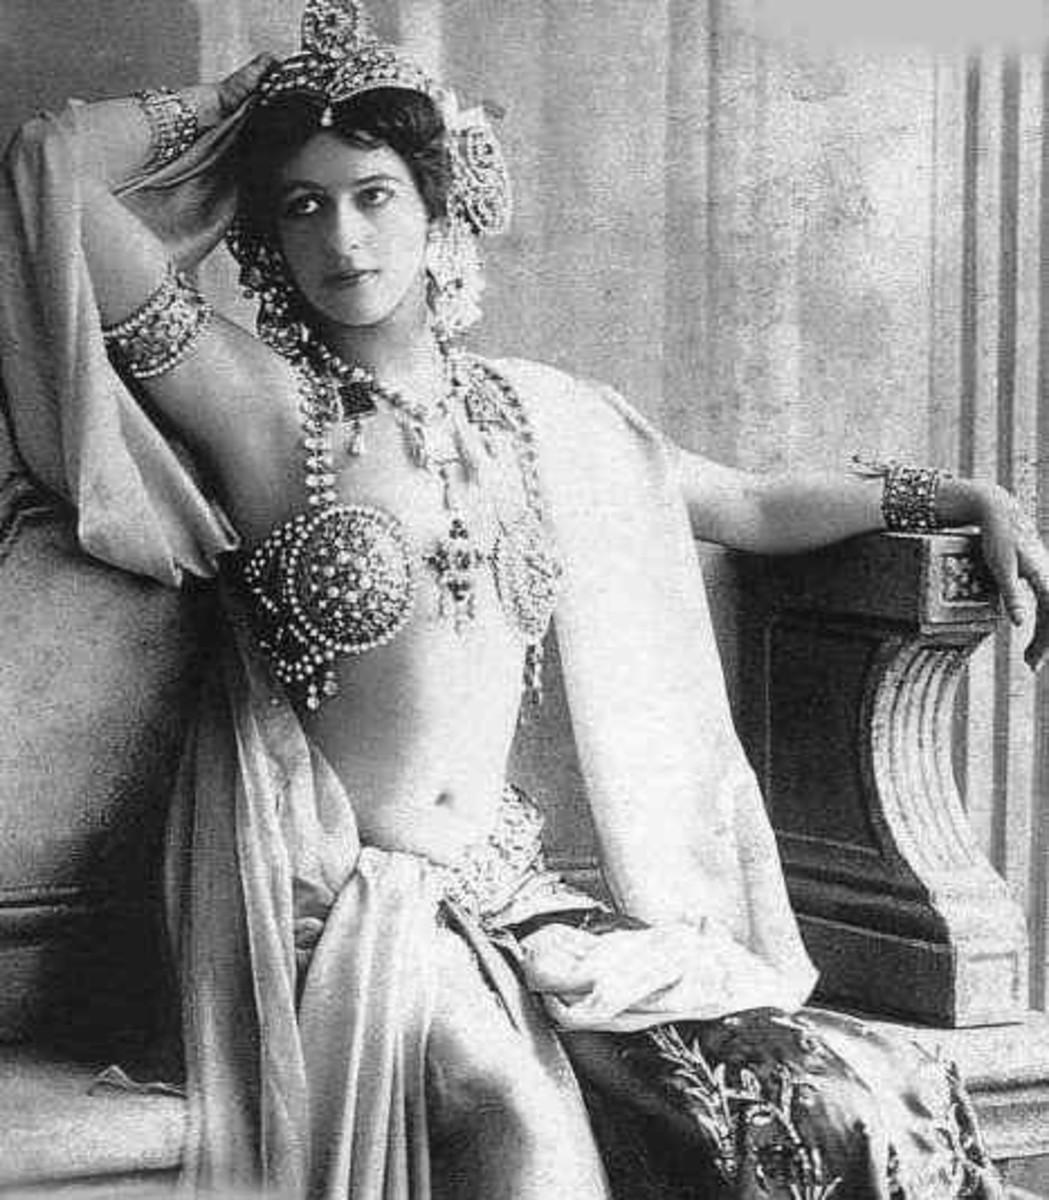 Mata-Hari, Margaretha Geertruida Zelle. Credit: Wikimedia Commons